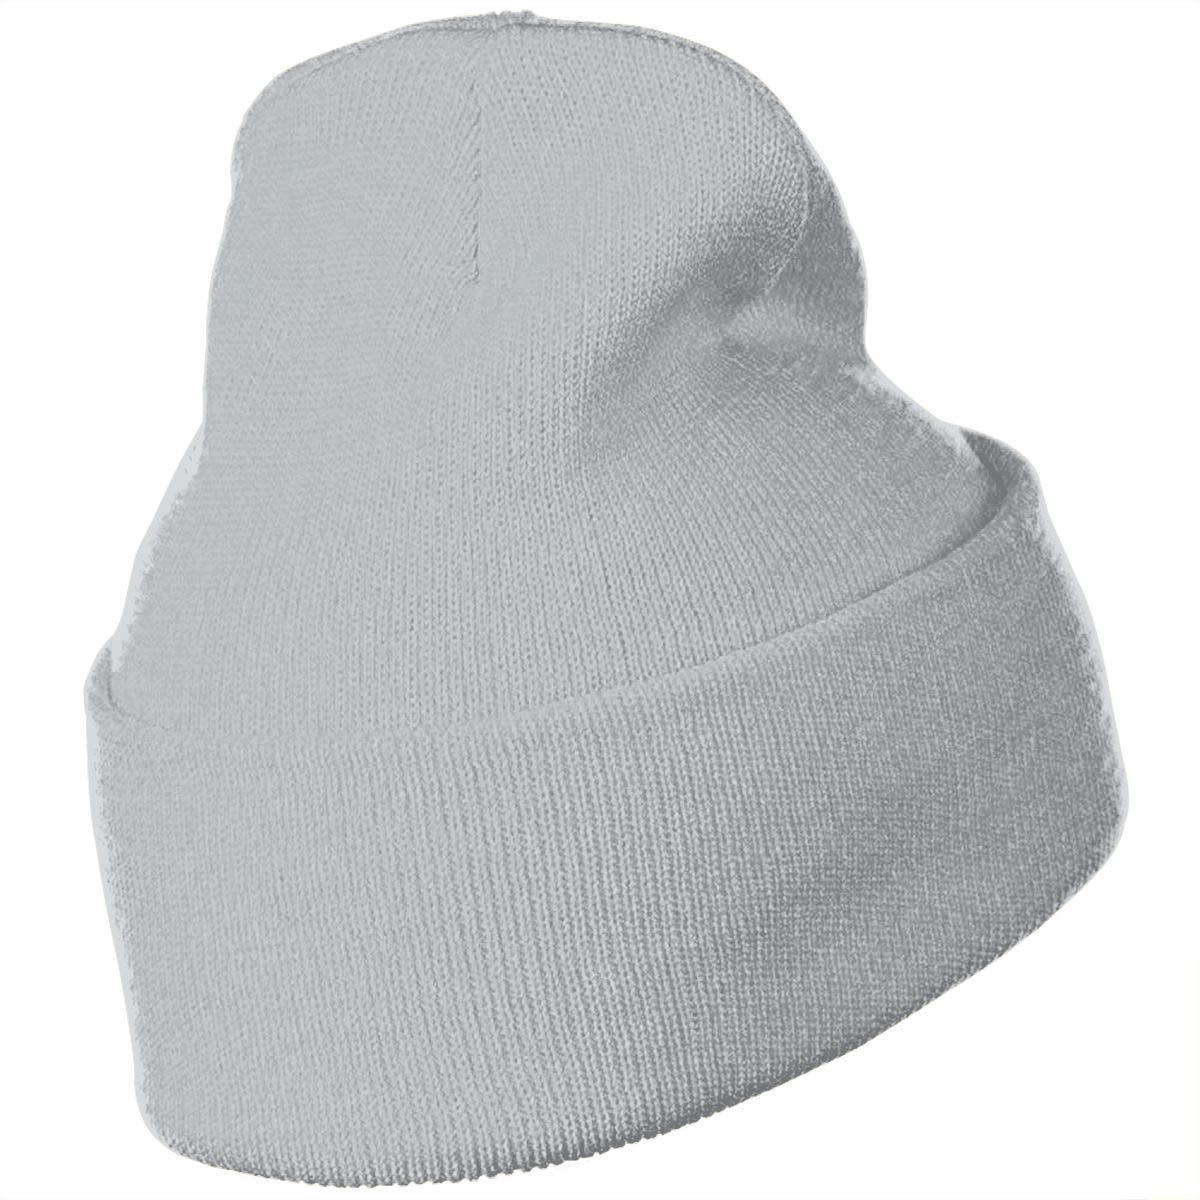 Warm /& Stylish Winter Hats Black Thick MACA Canary-Islands Unisex Slouch Beanie Hats